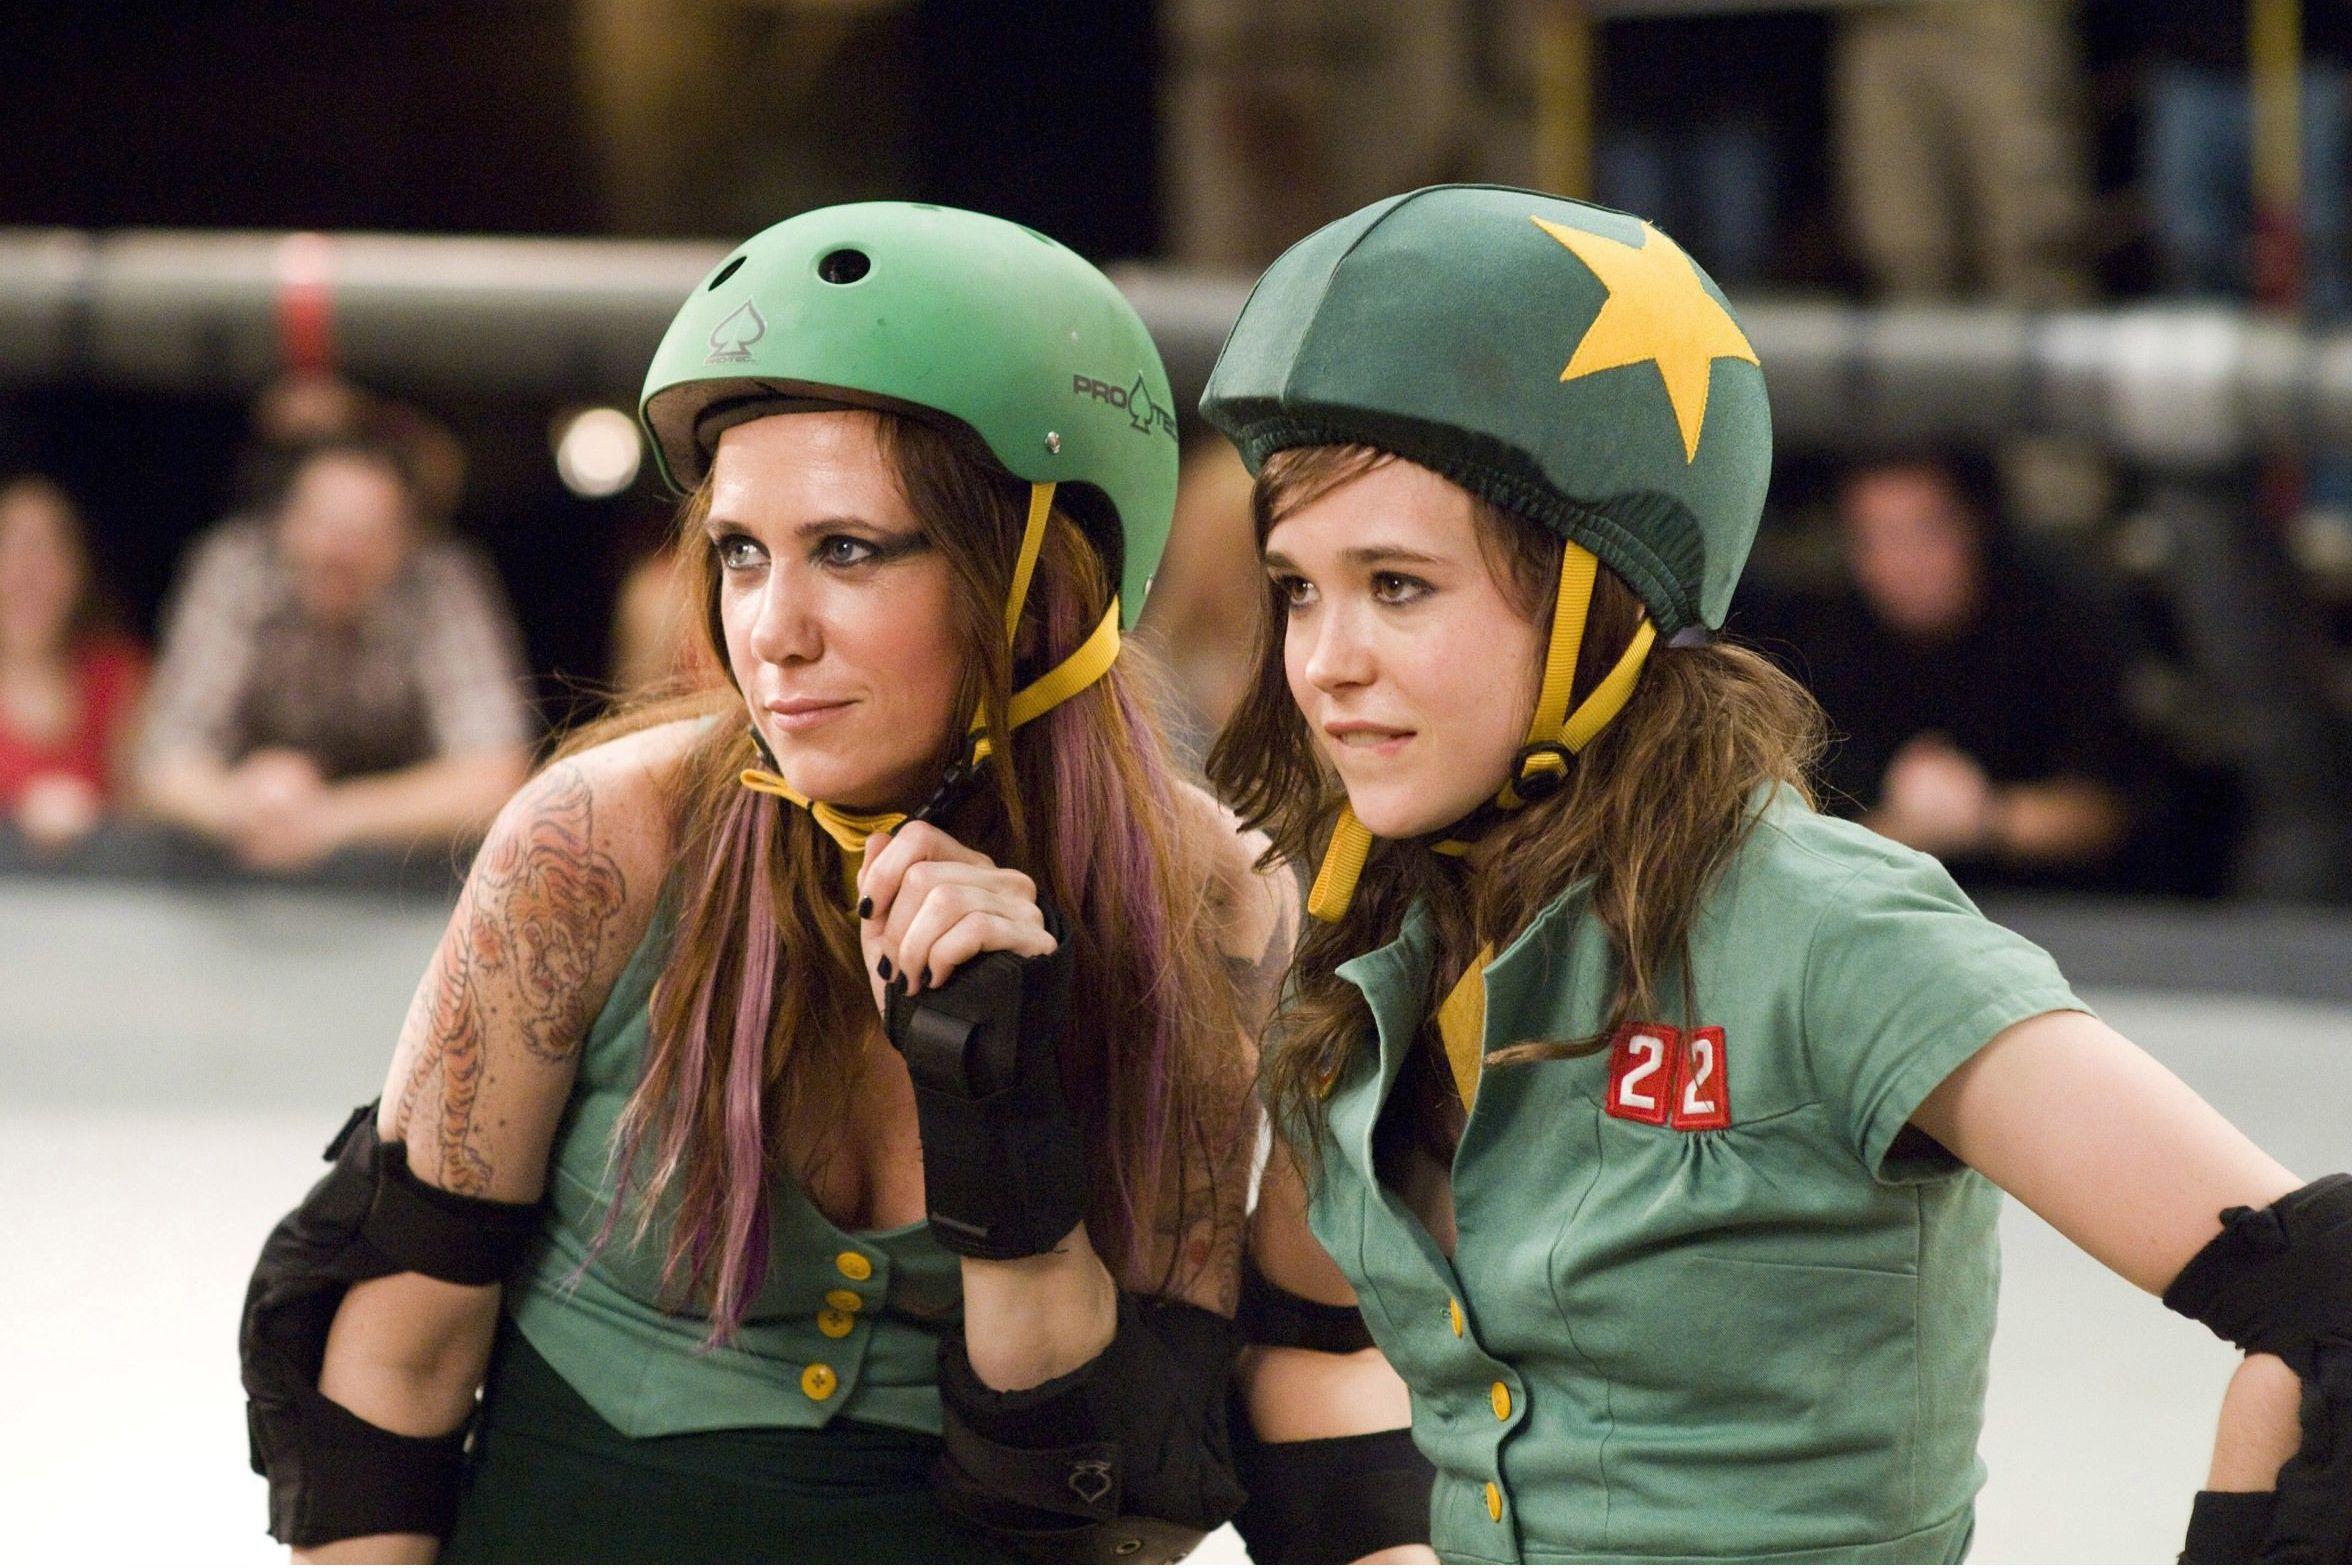 Ellen Page and Kristen Wiig in Whip It